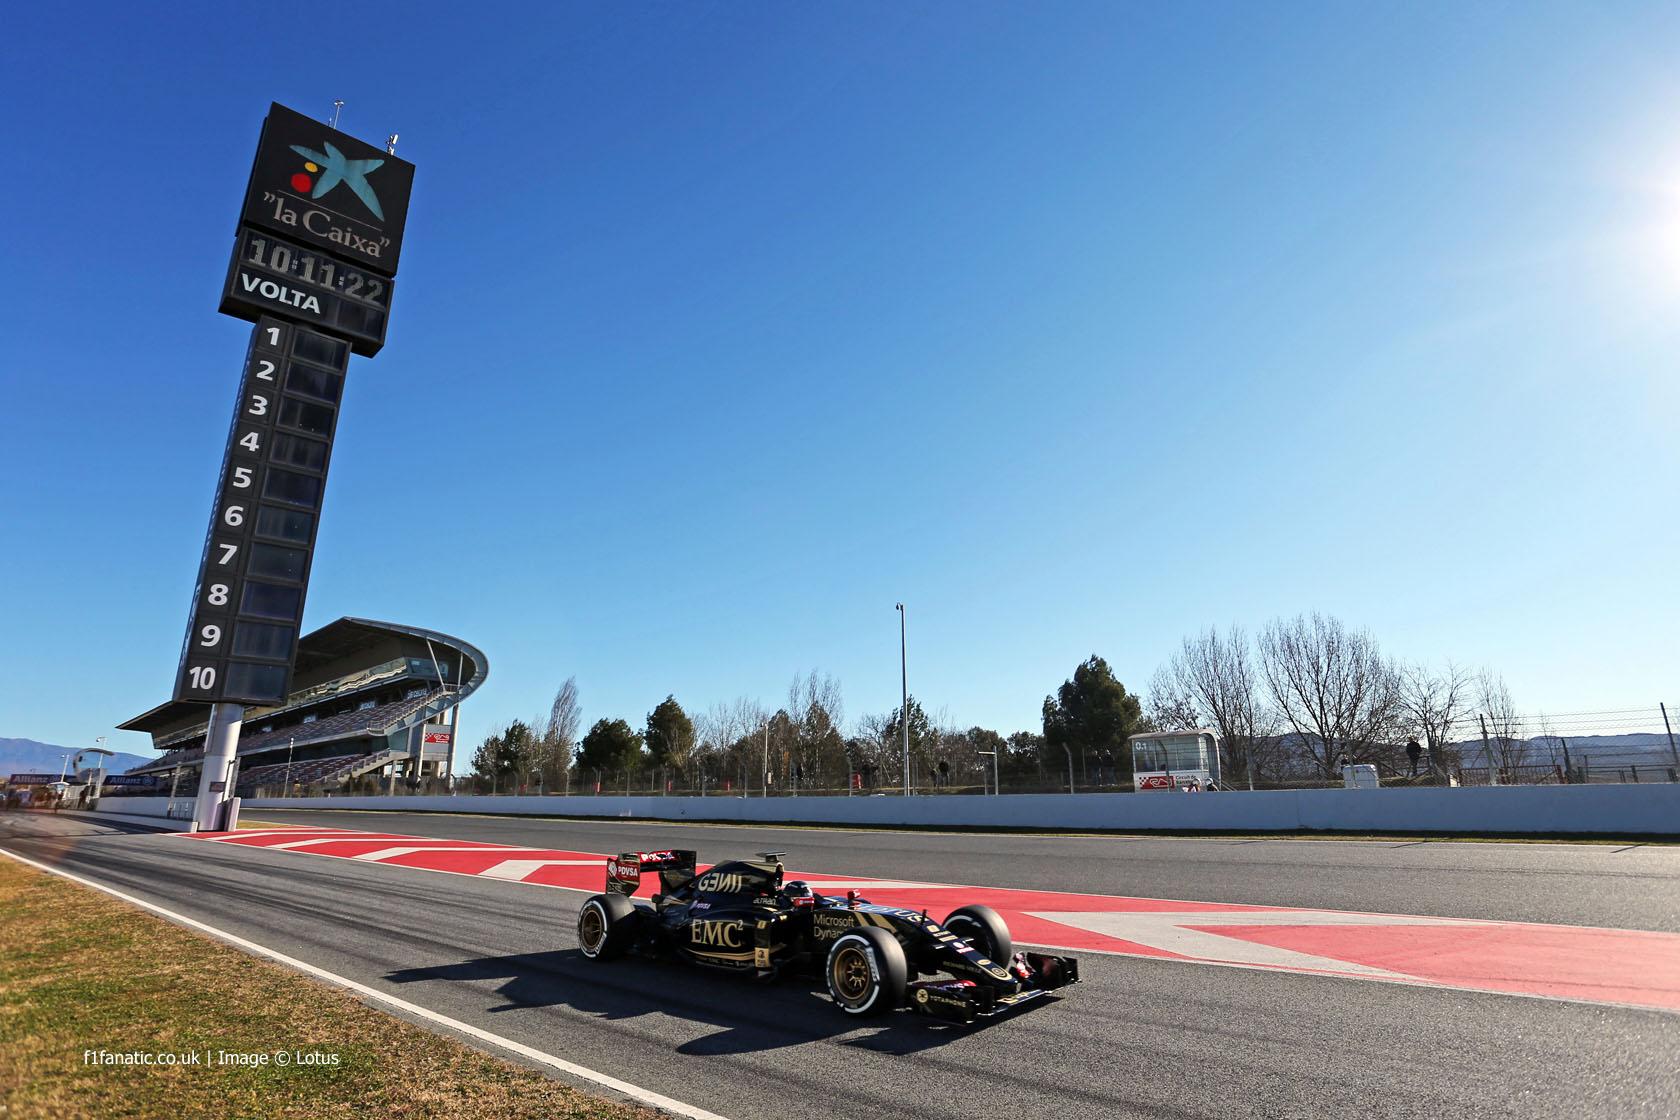 Romain Grosjean, Lotus, Circuit de Catalunya, 2015